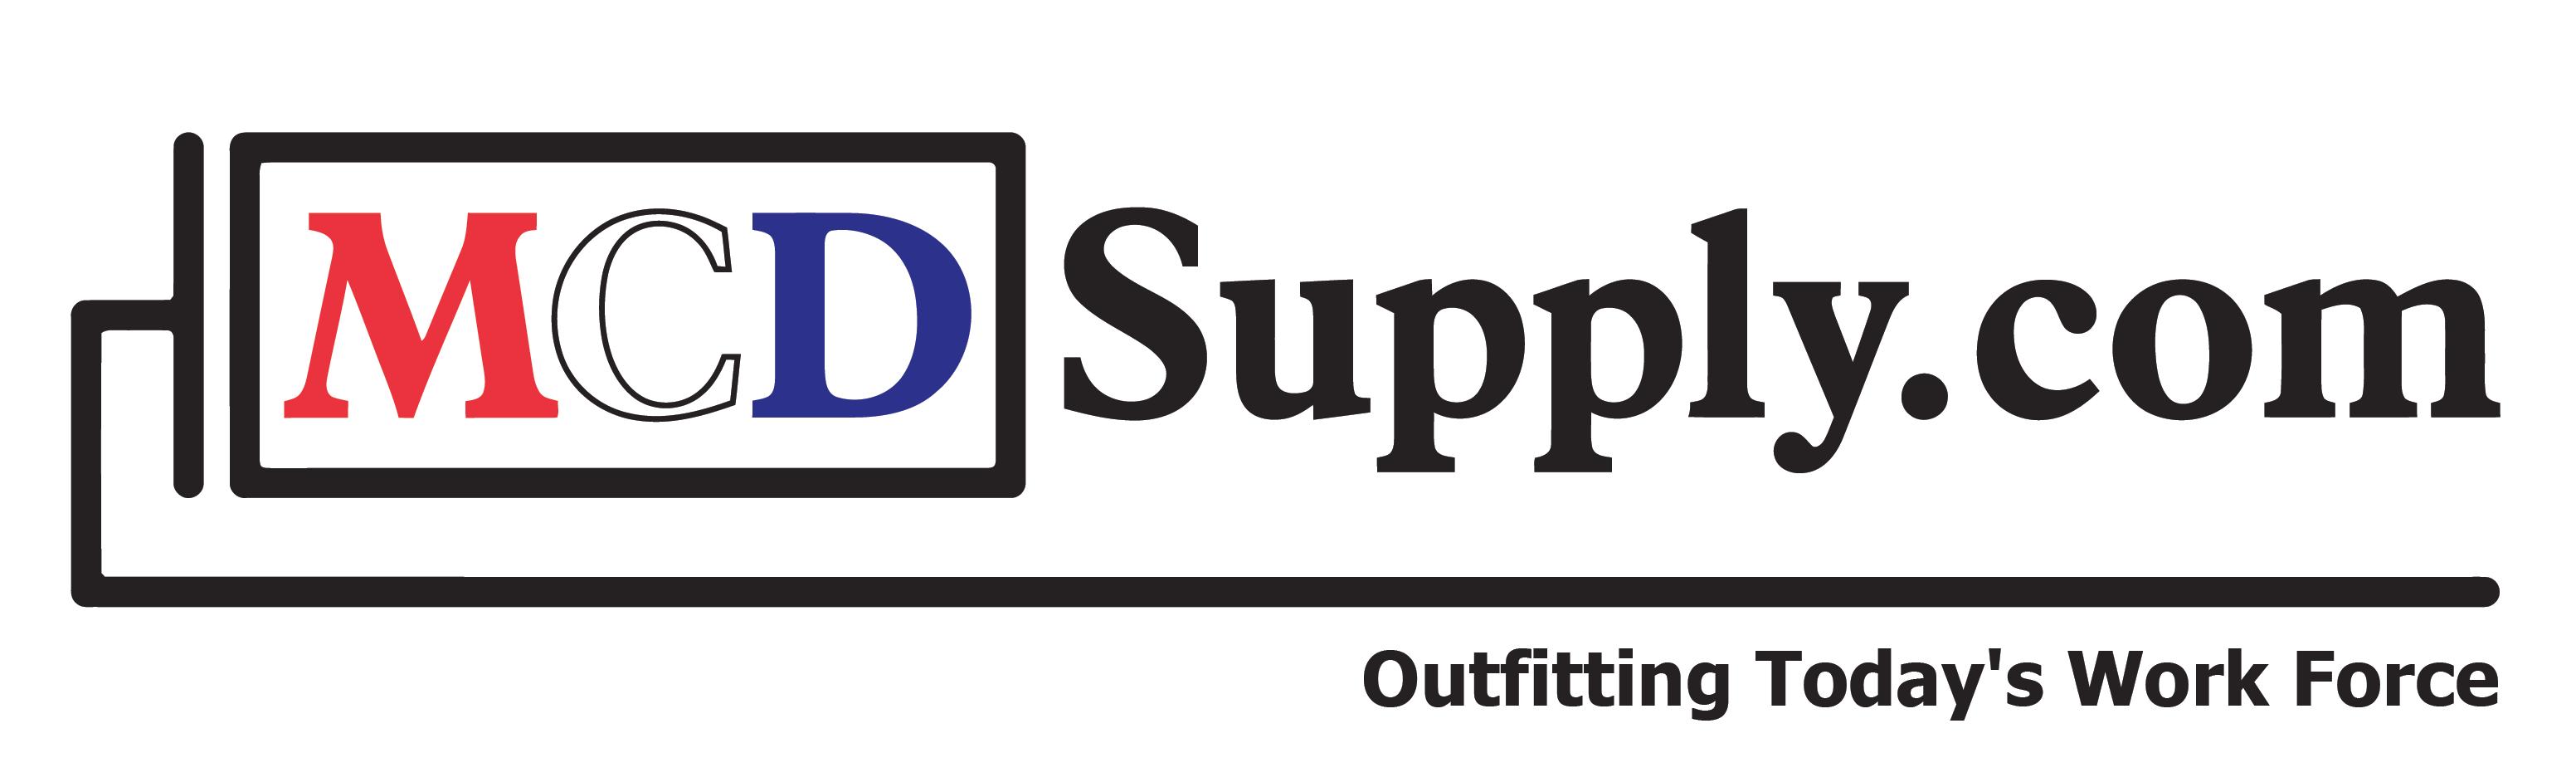 MCD Supply.com